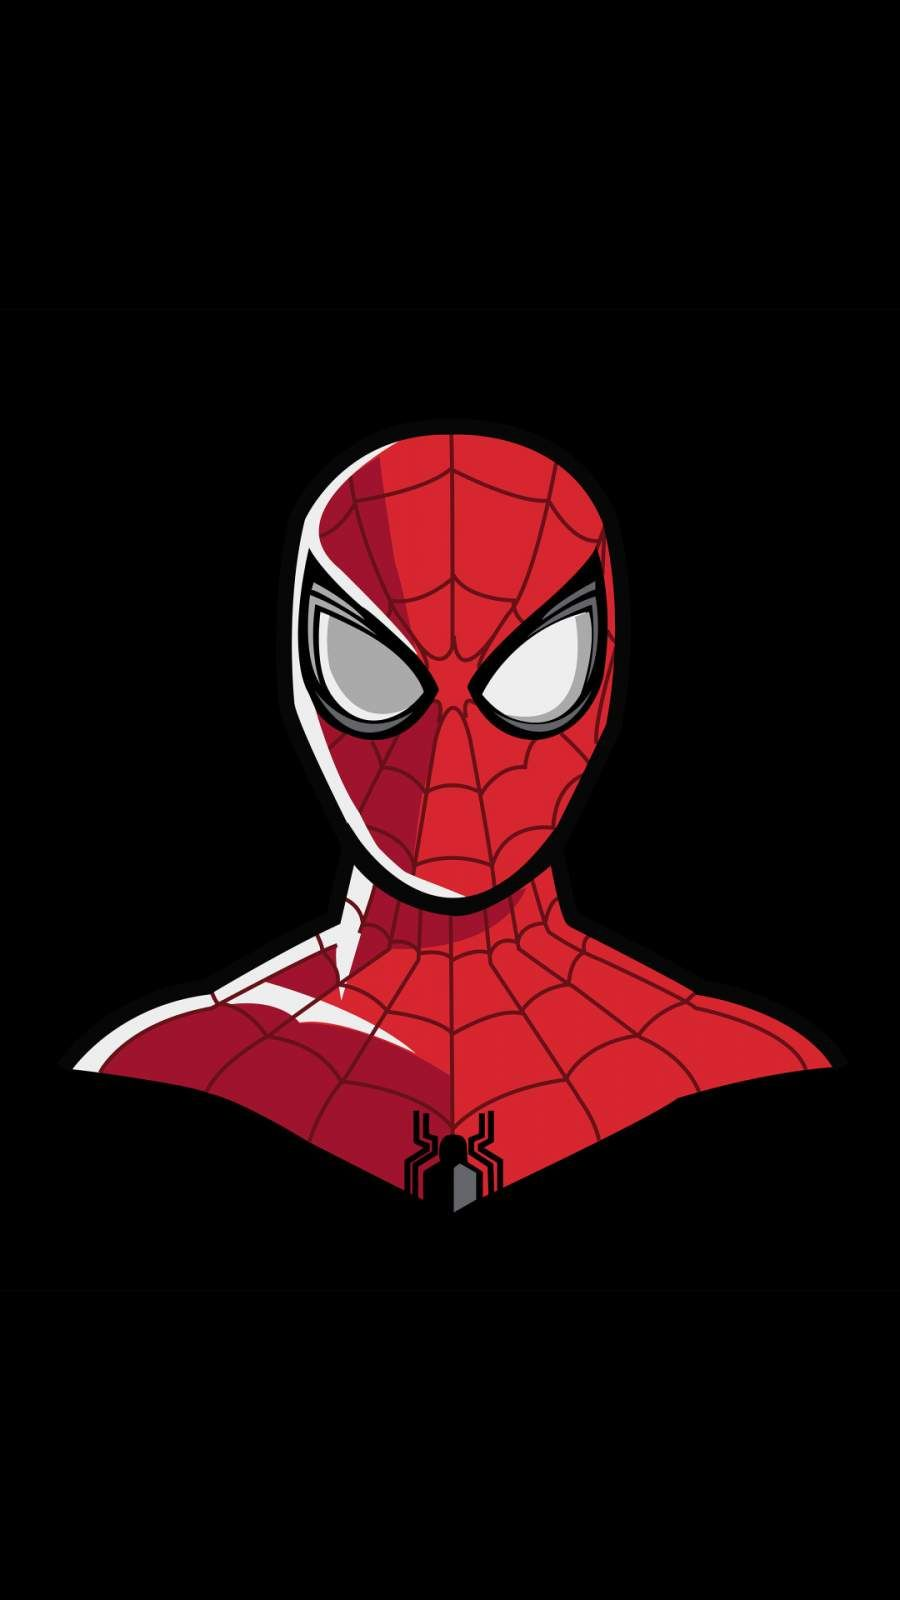 Iphone Wallpapers For Iphone 8 Iphone 8 Plus Iphone 6s Iphone 6s Plus Iphone X And Ipod Touch High Quality In 2020 Spiderman Spiderman Artwork Superhero Wallpaper